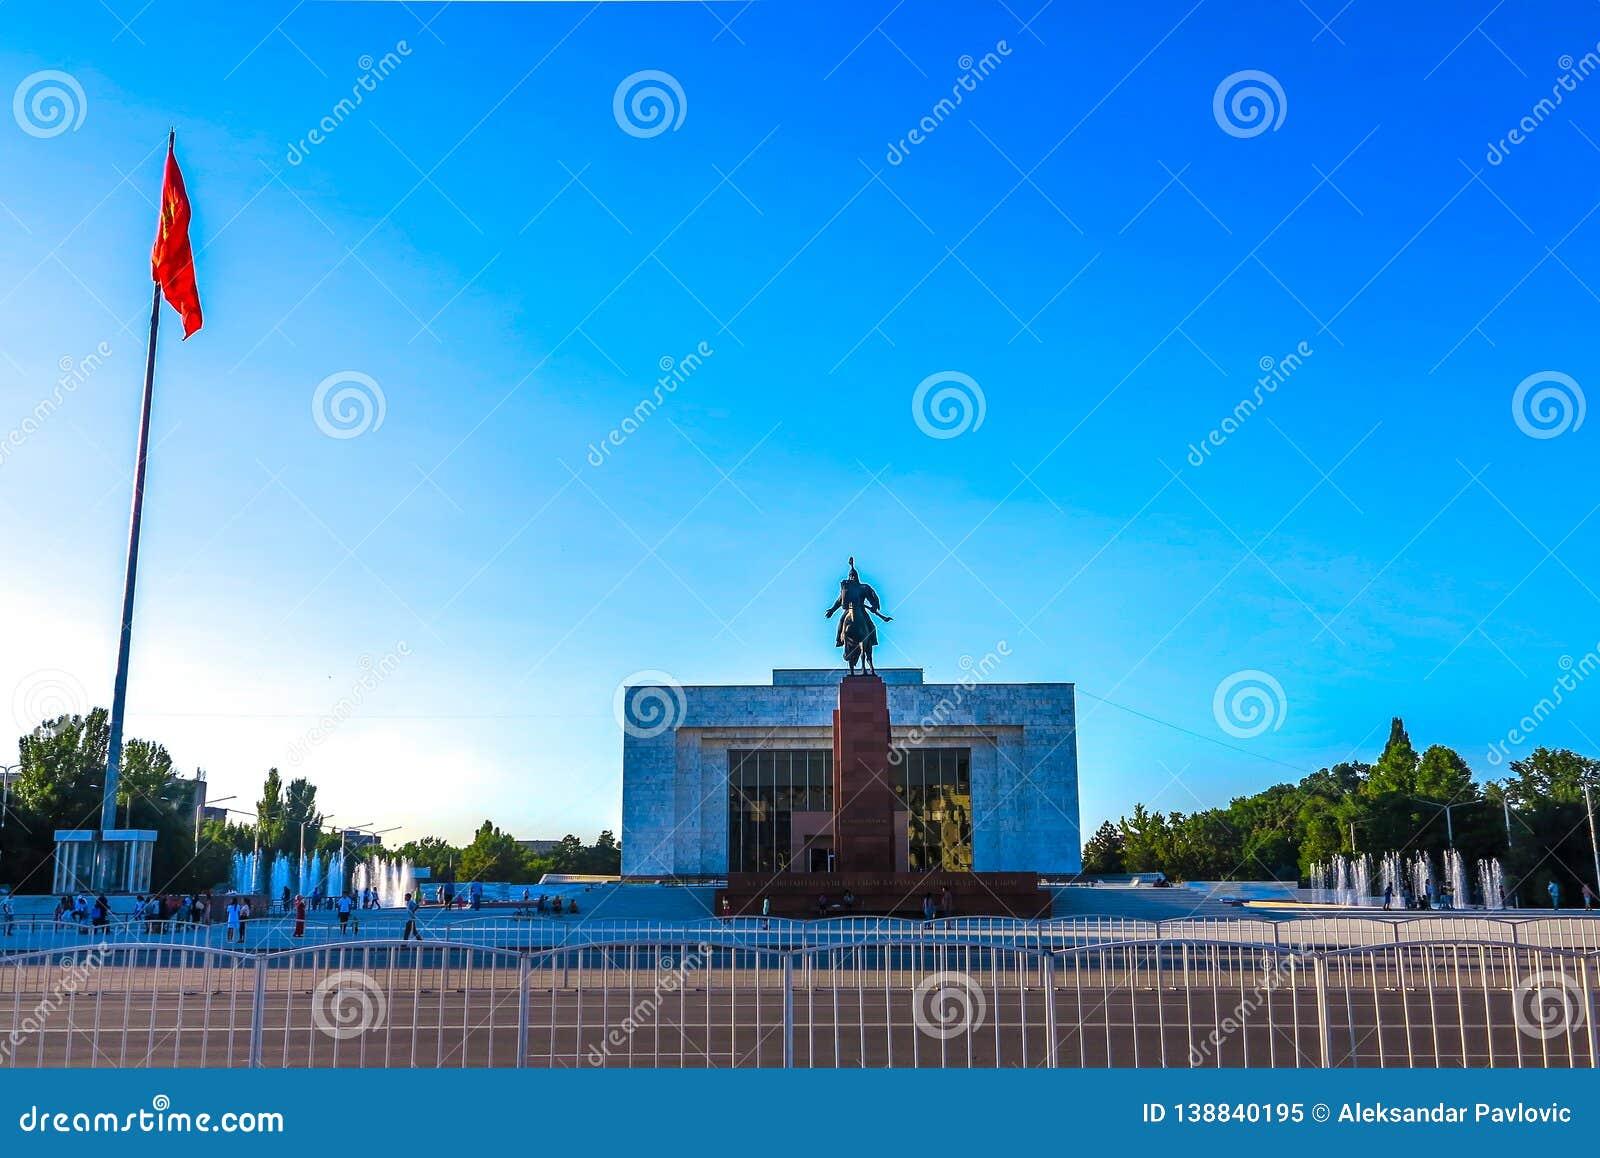 Bishkek Ala Too Square 05